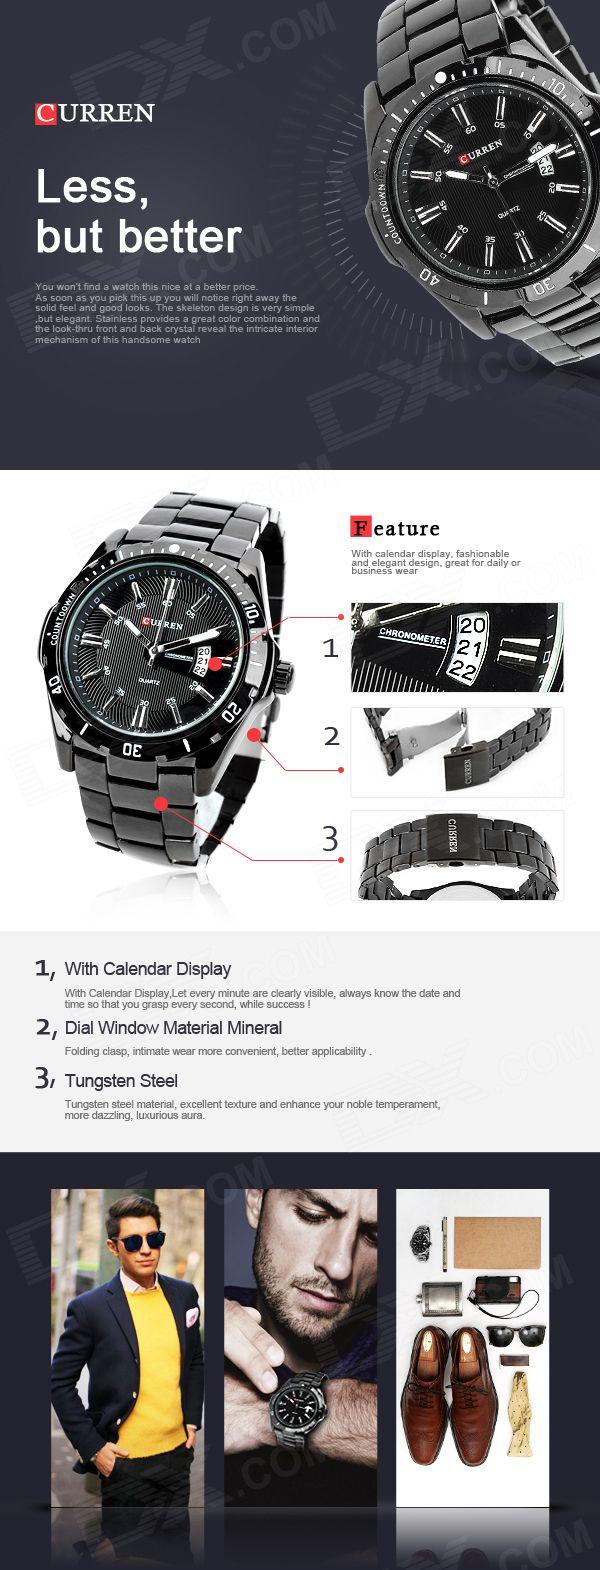 CURREN 8110 Men's Steel Band Quartz Wrist Watch w/ Calendar - Black - Free Shipping - DealExtreme